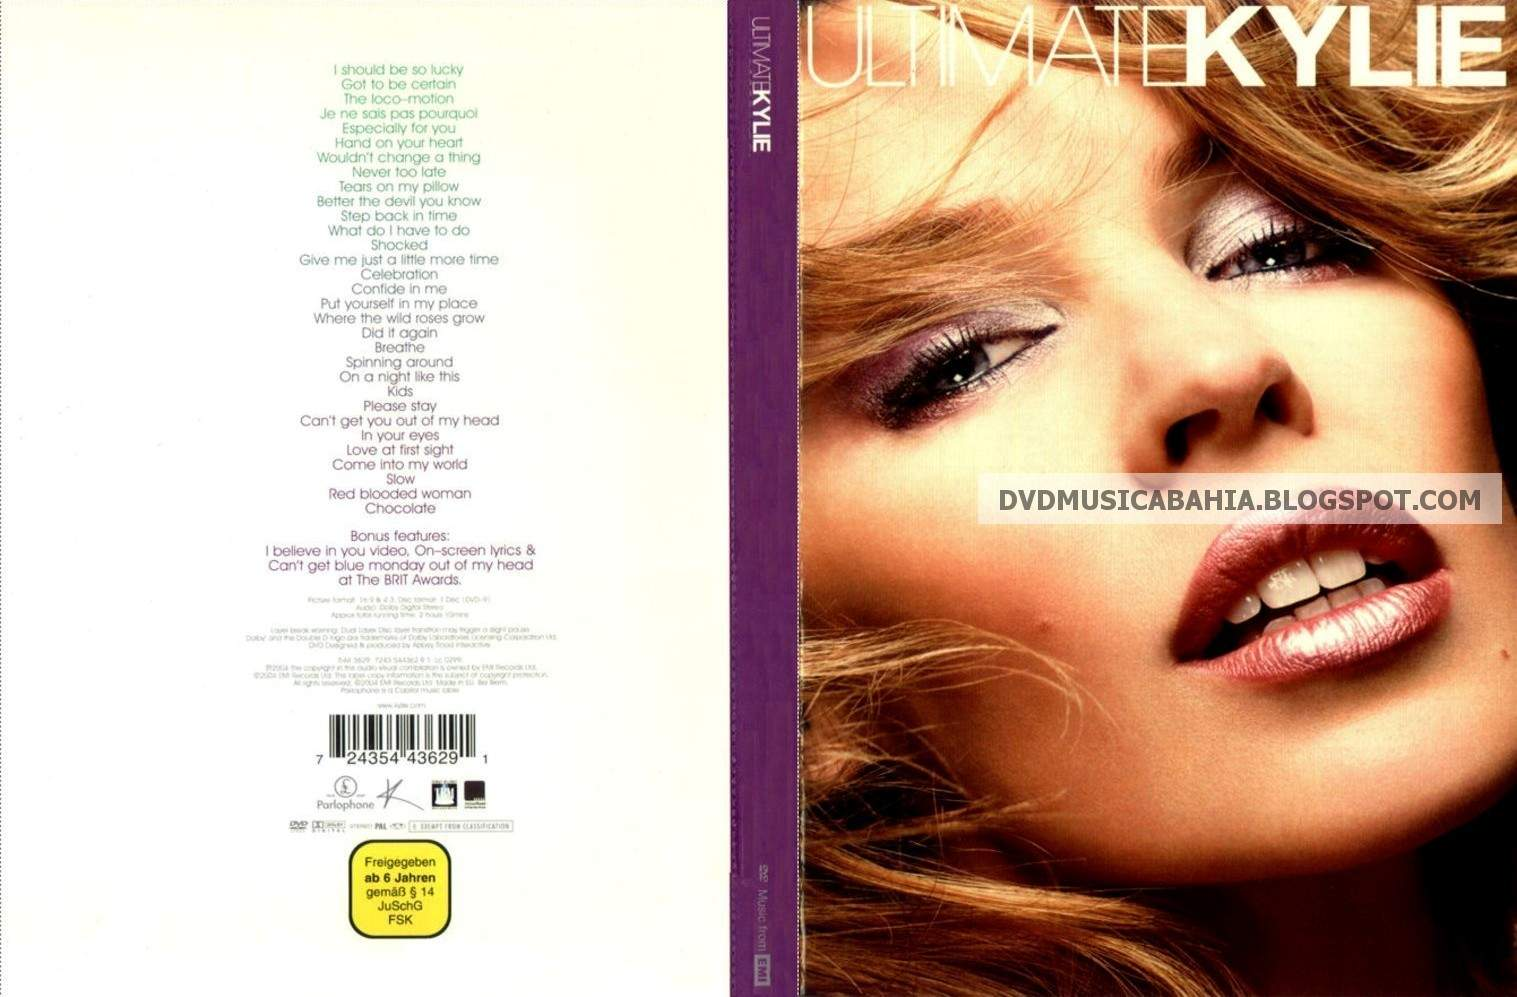 http://3.bp.blogspot.com/_PiUVny6RPwY/TSkGWltbq-I/AAAAAAAABZc/_4YhEeIfZOQ/s1600/Kylie+Minogue+-+Ultimate+Kylie.jpg